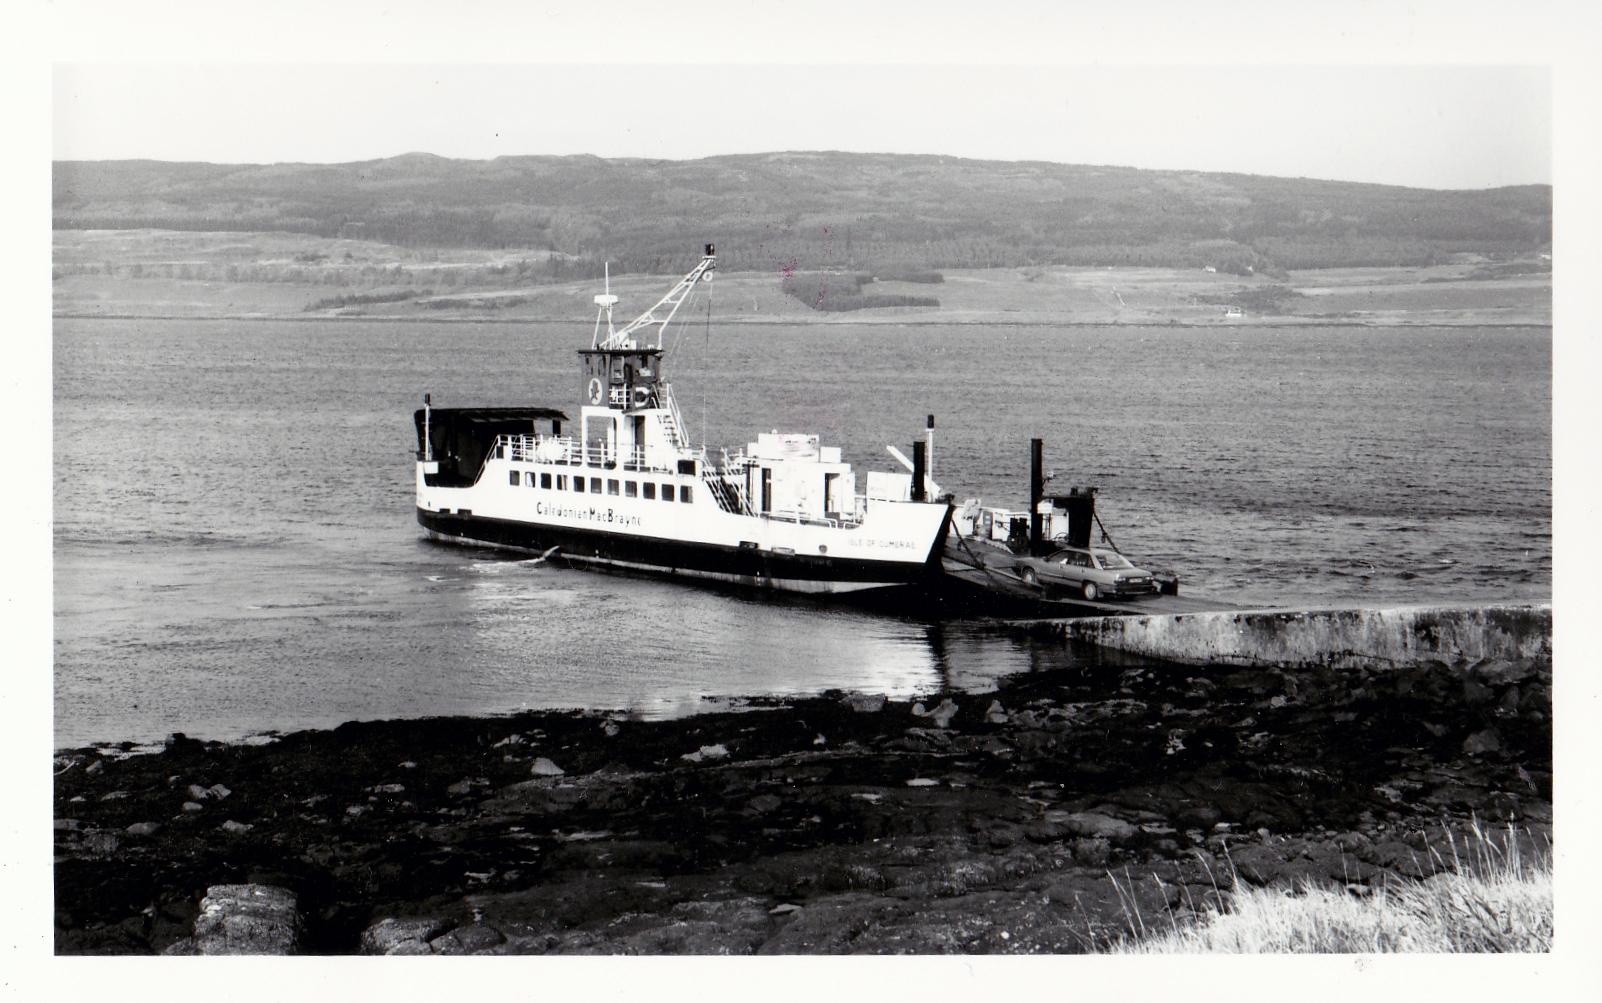 Isle of Cumbrae at Fishnish (Jim Aikman Smith)